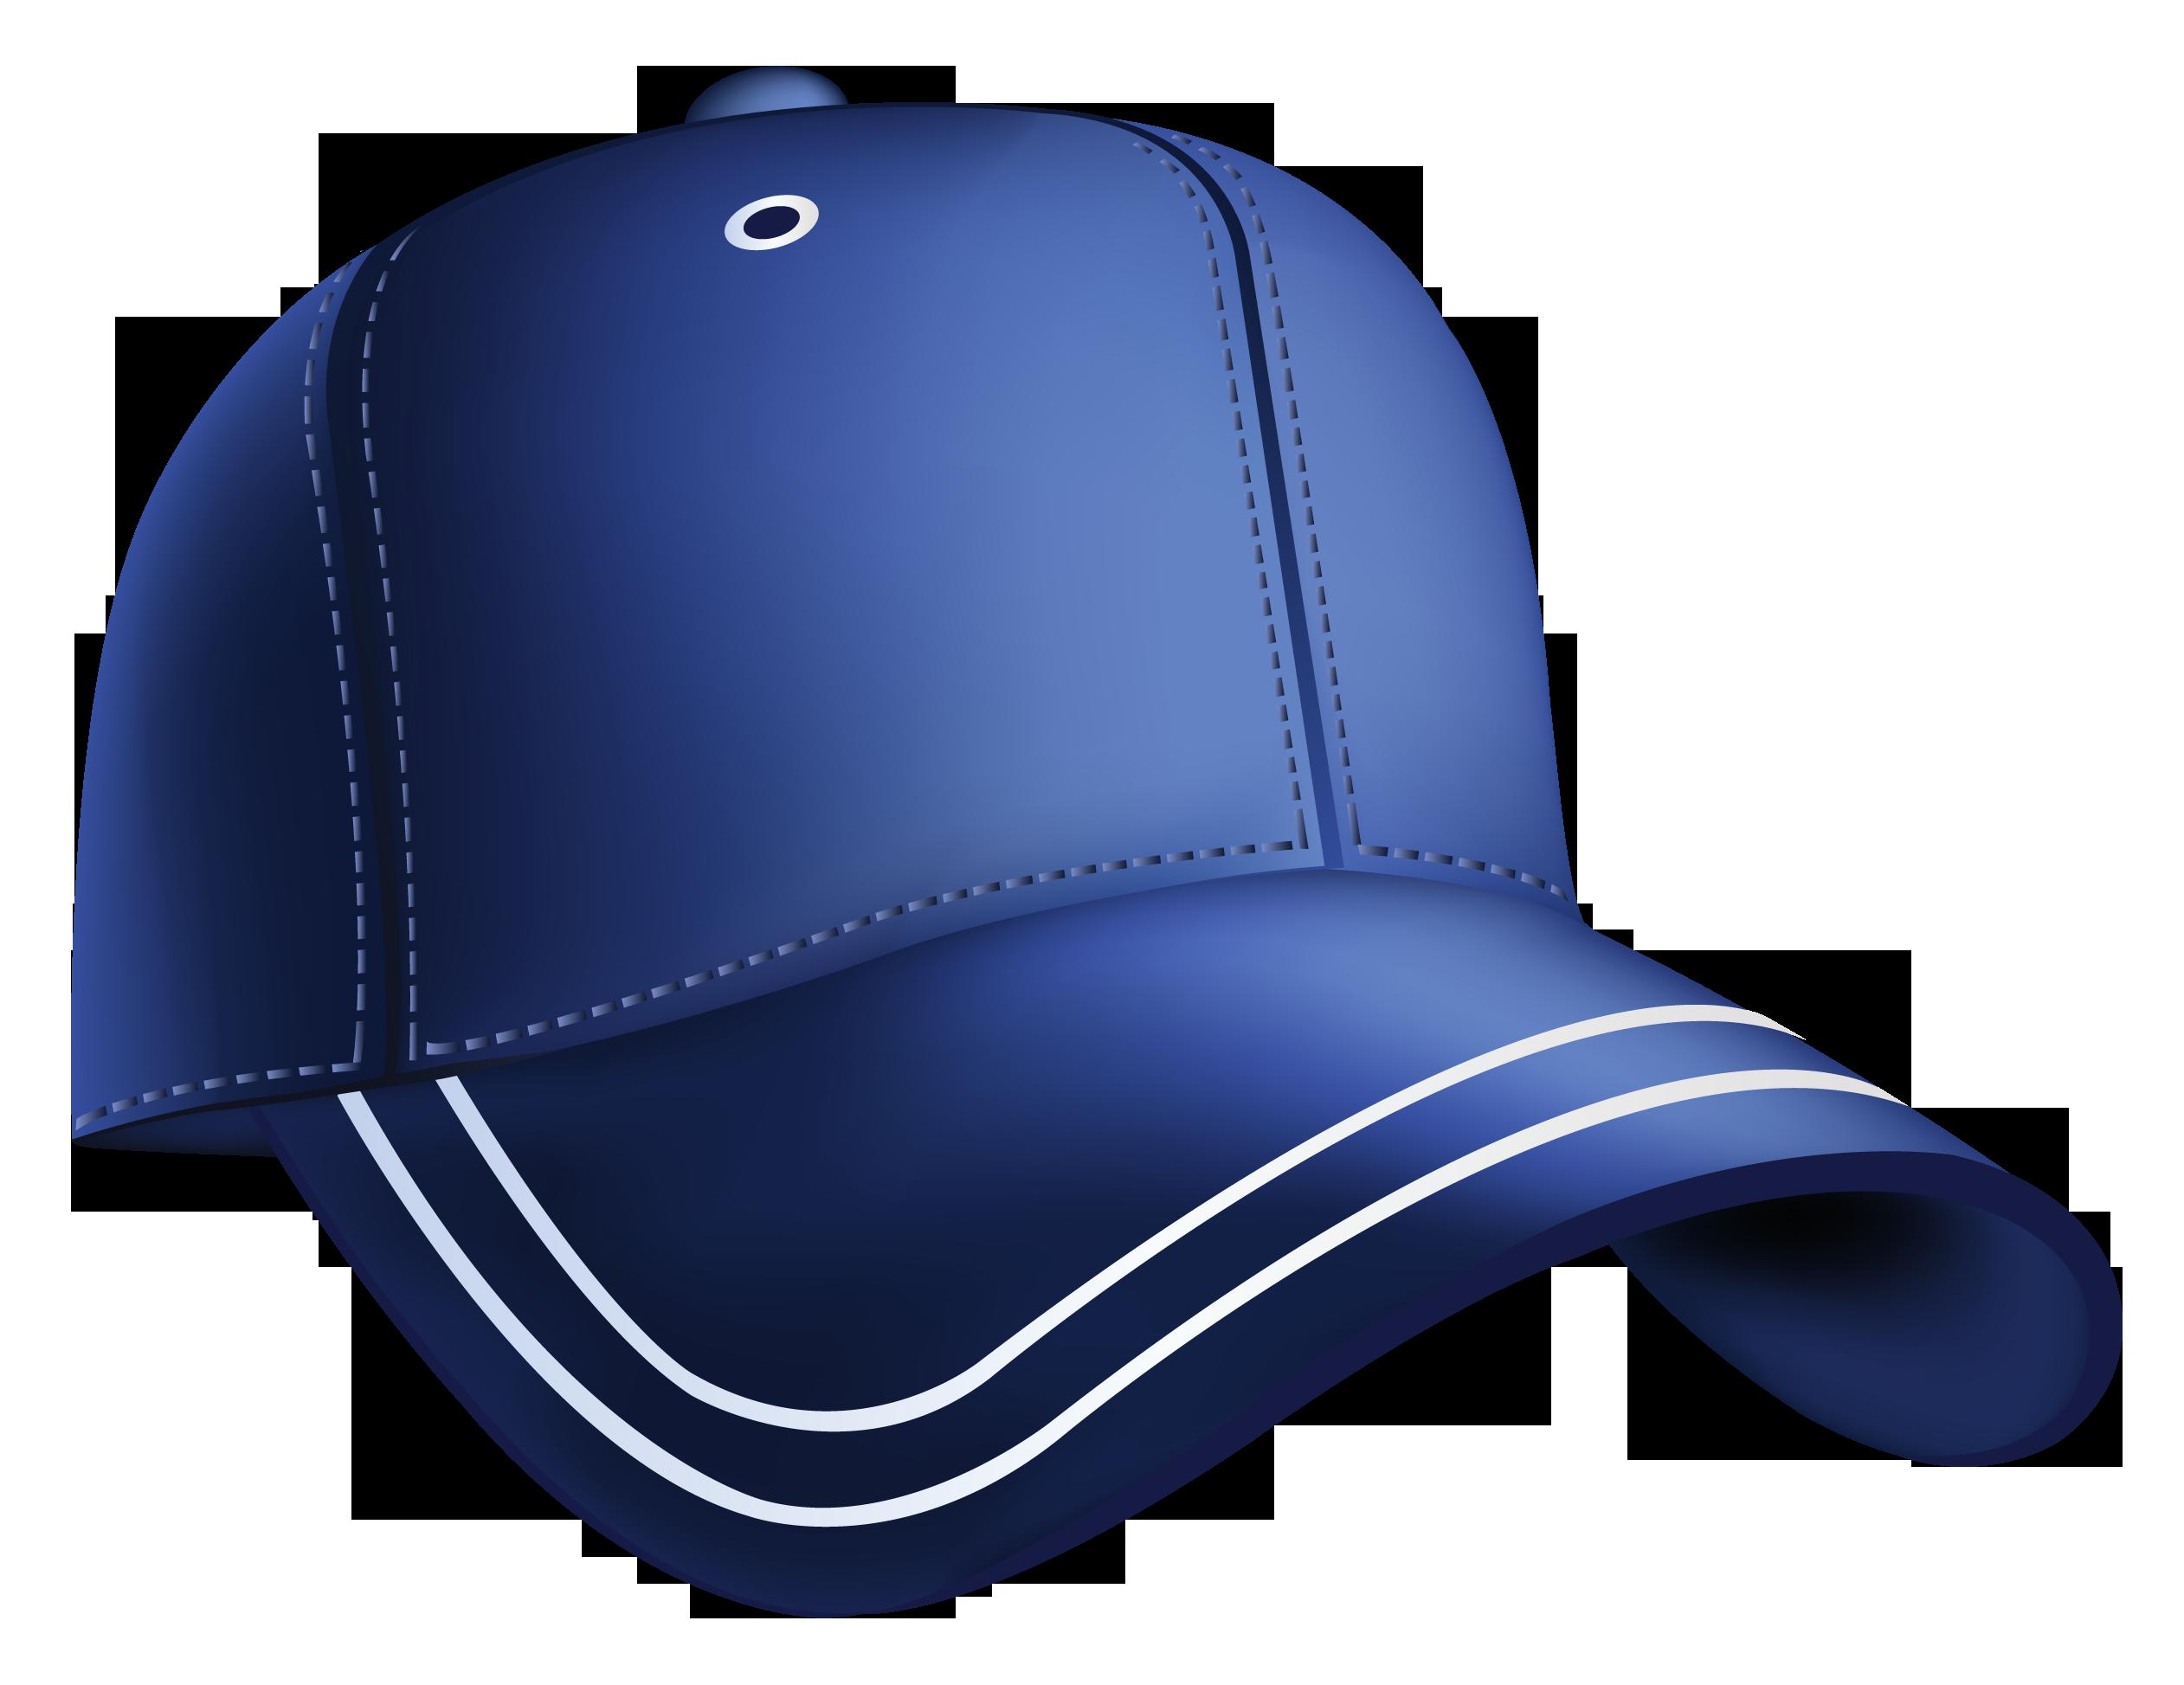 Baseball cap PNG image - Baseball Cap PNG